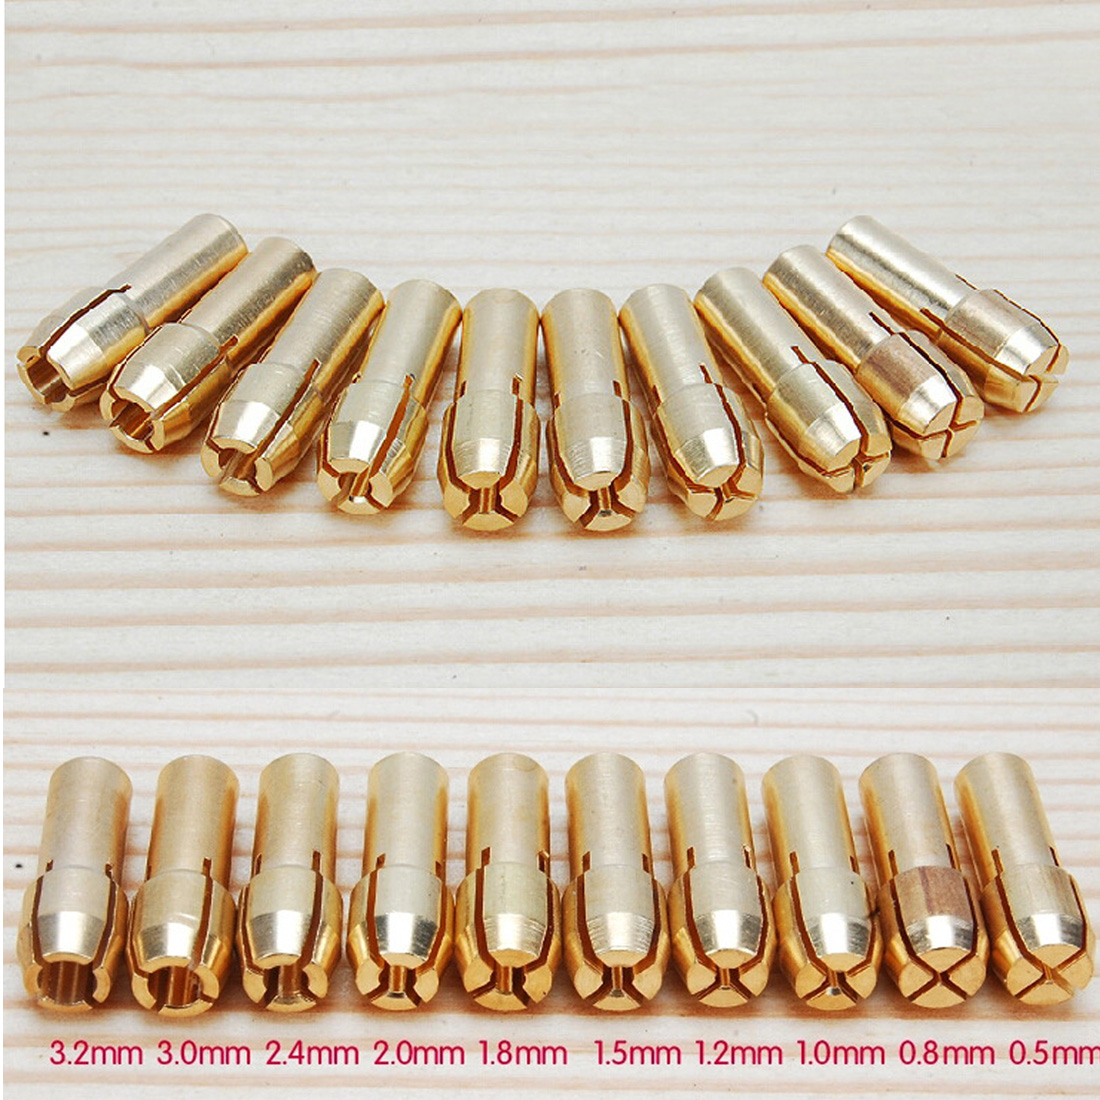 0.5-3.2mm 4.3mm Shank 10Pcs /set Brass Drill Chucks Collet Bits for Dremel Rotary Tool0.5-3.2mm 4.3mm Shank 10Pcs /set Brass Drill Chucks Collet Bits for Dremel Rotary Tool